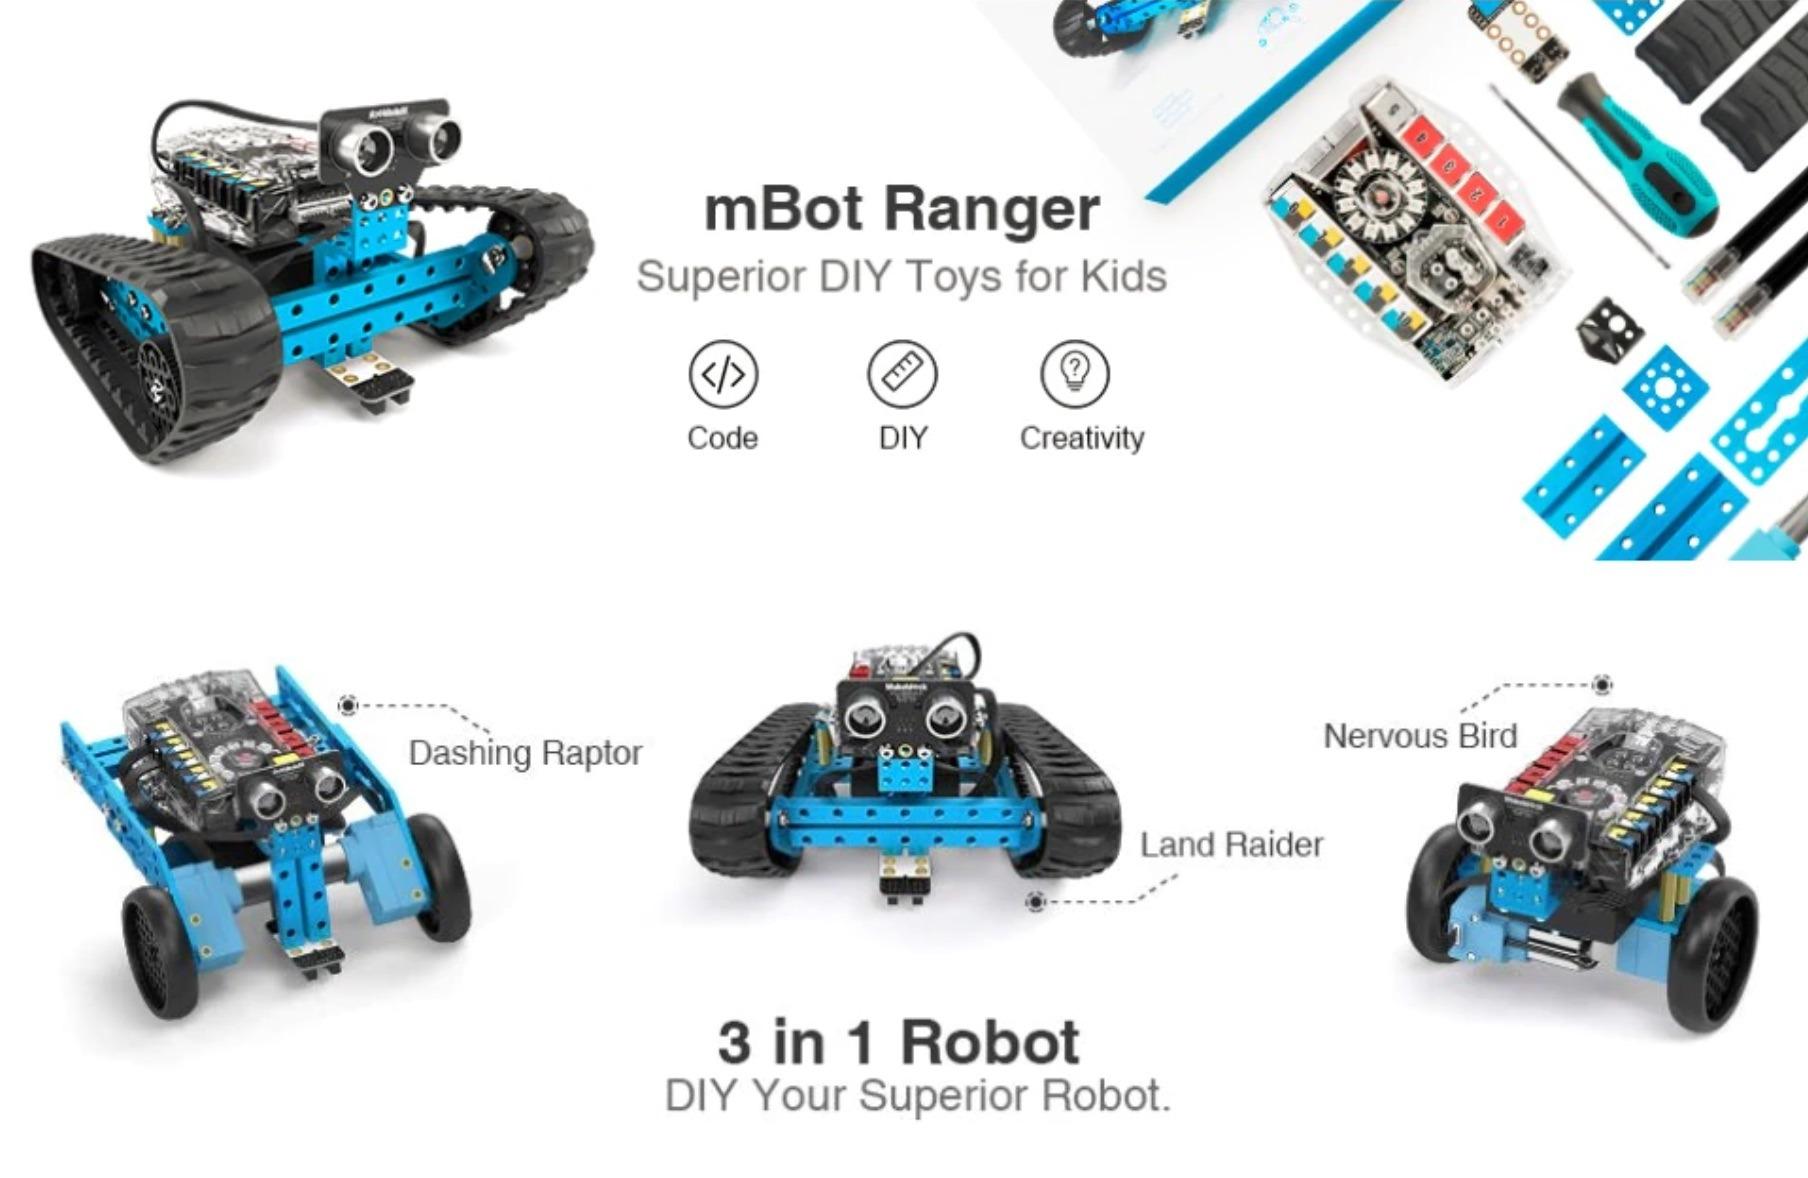 makeblock m bot ranger robot kit review